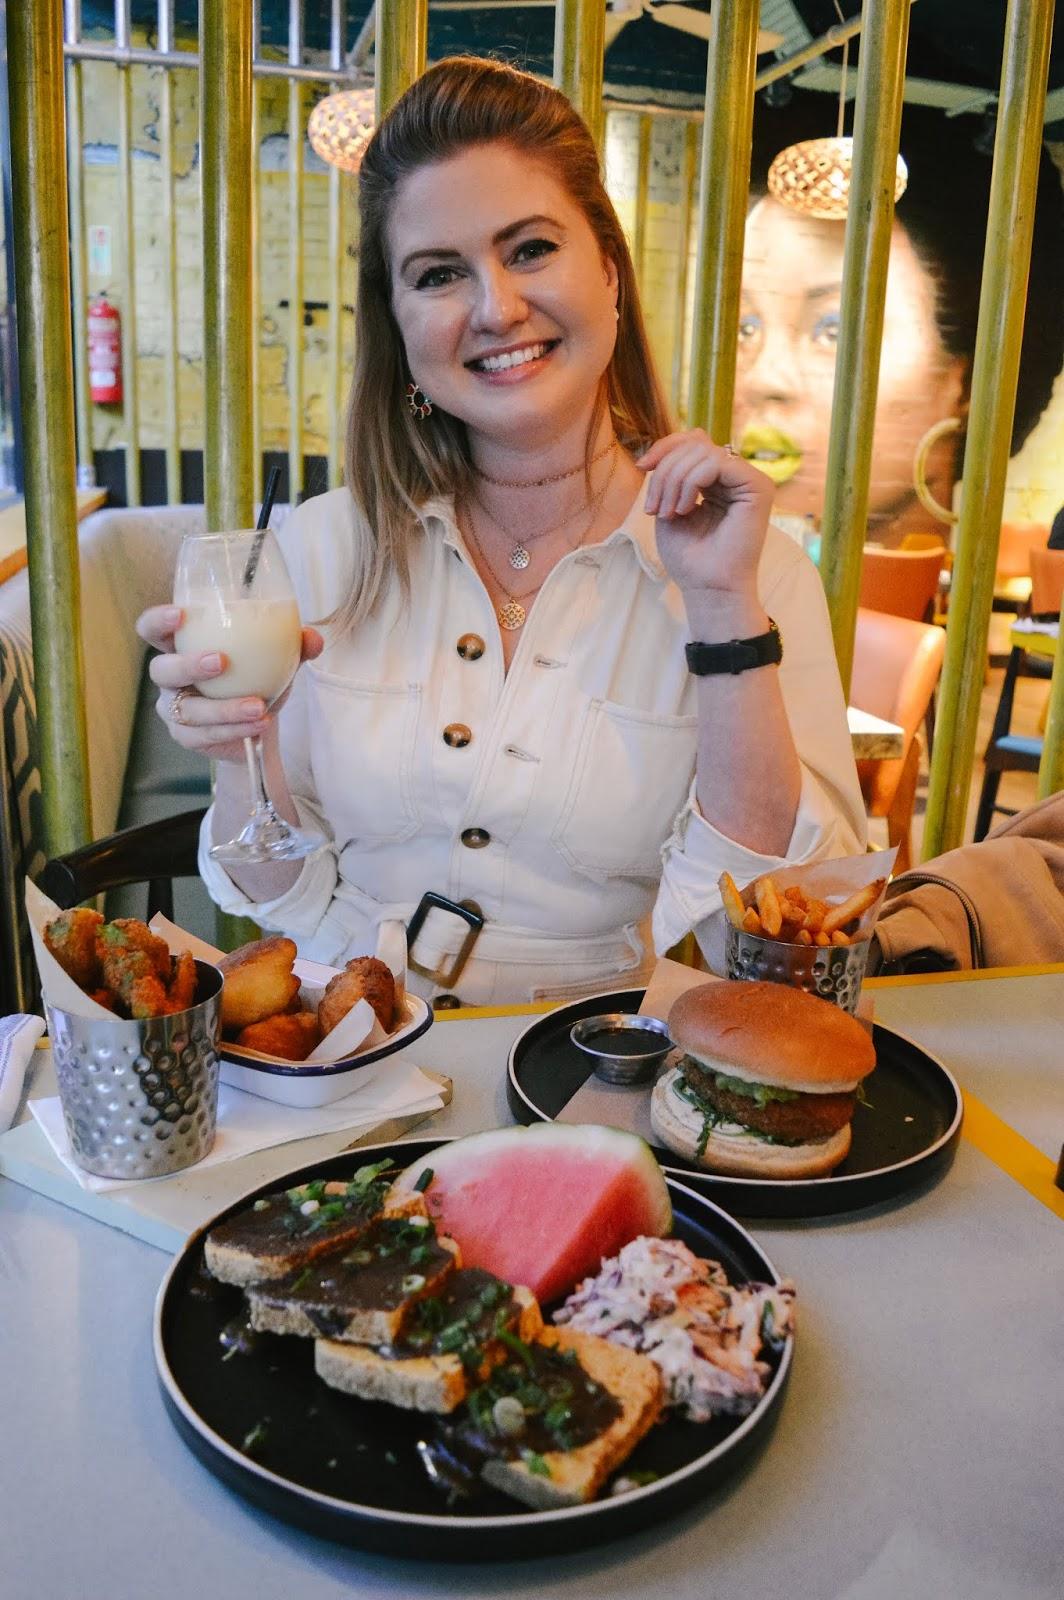 Dalry Rose Blog reviews the vegan menu at Turtle Bay in Winchester